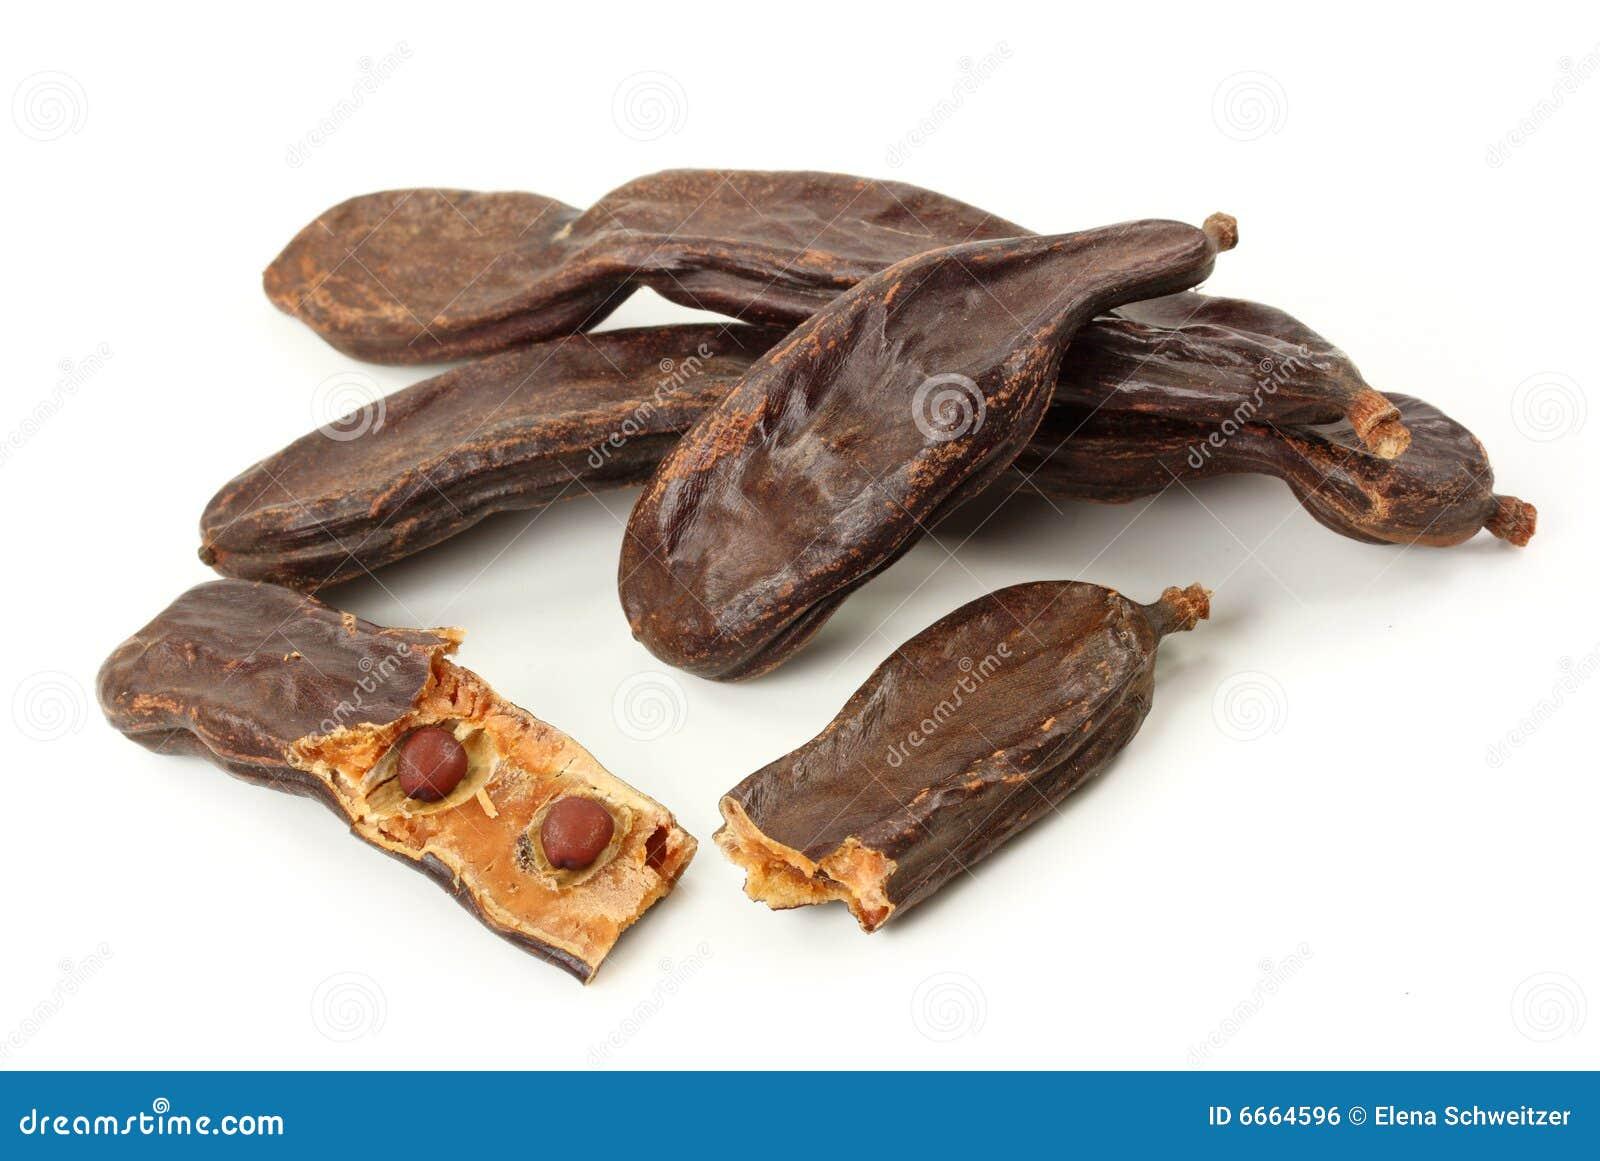 Ripe carob pods or St. John s bread